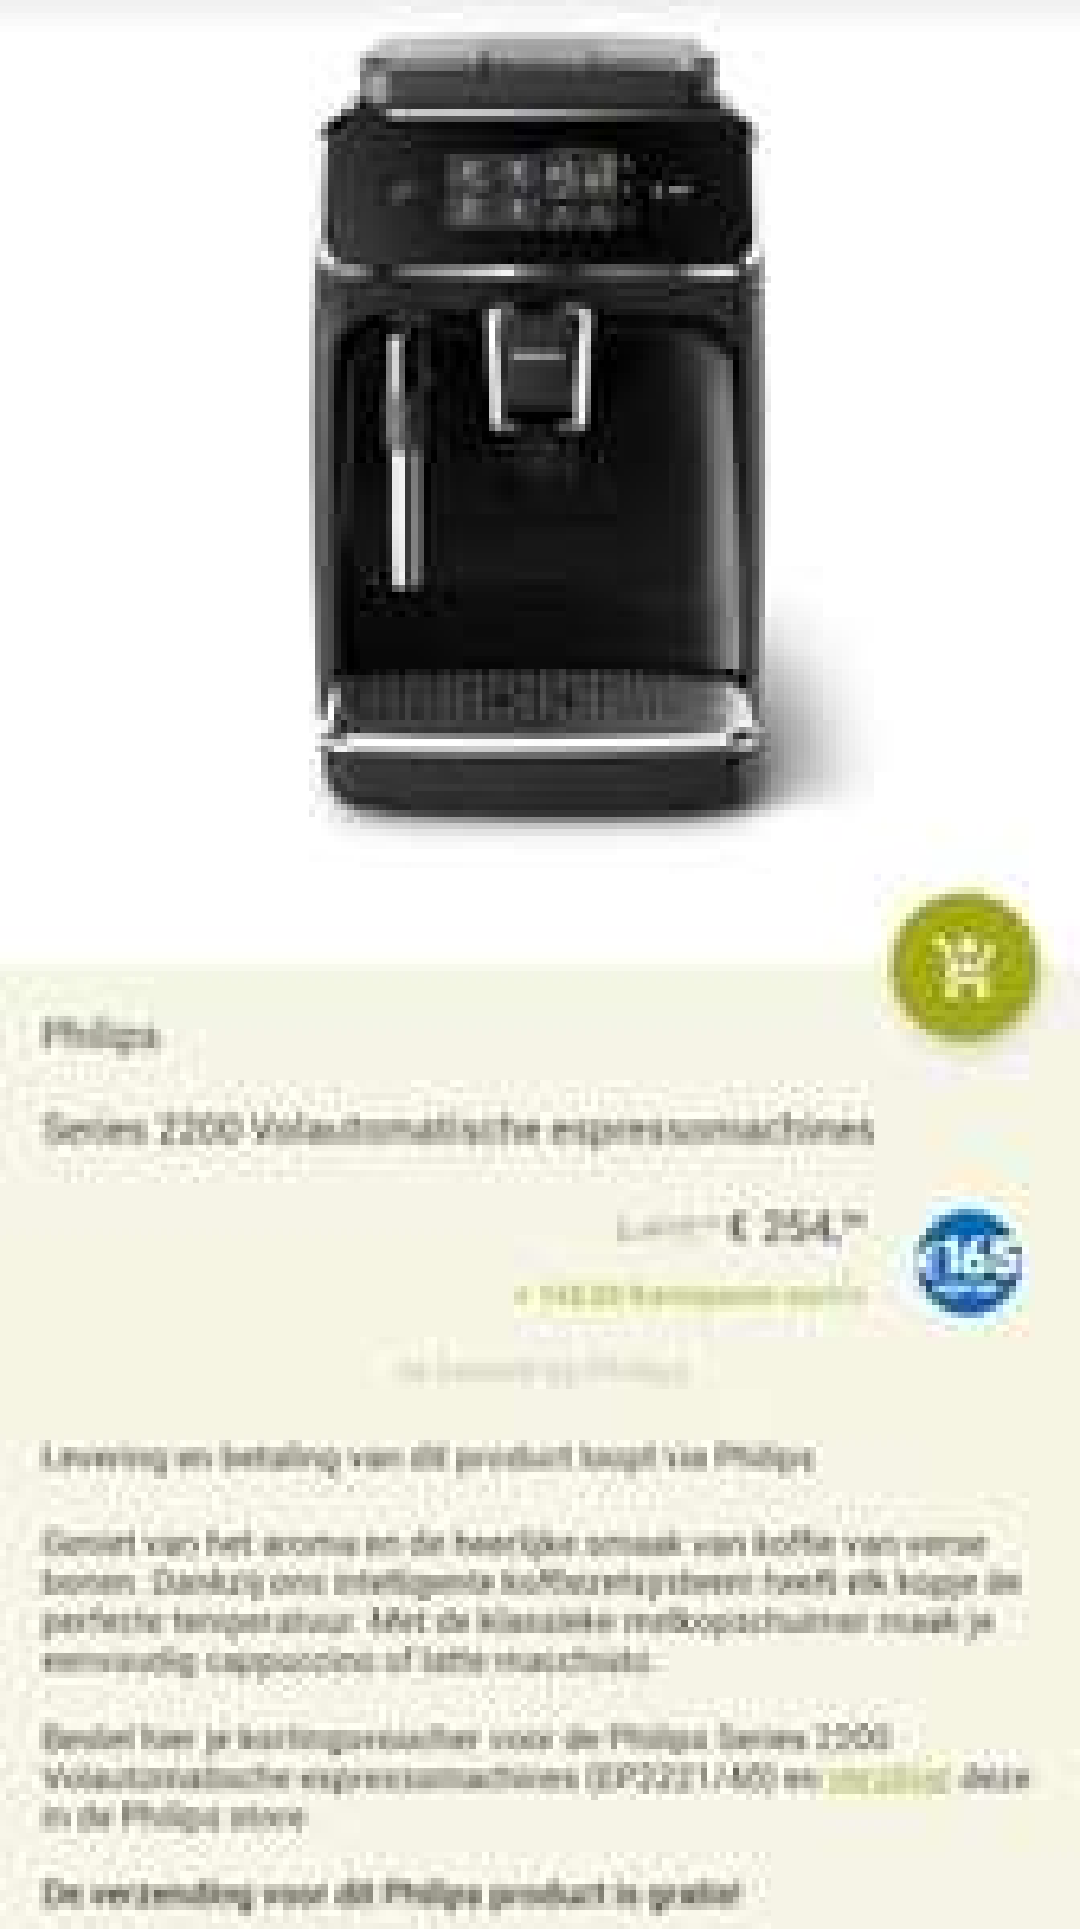 Philips Series EP2221/40 espressomachine €254,99 + 165 Eurosparen euro's